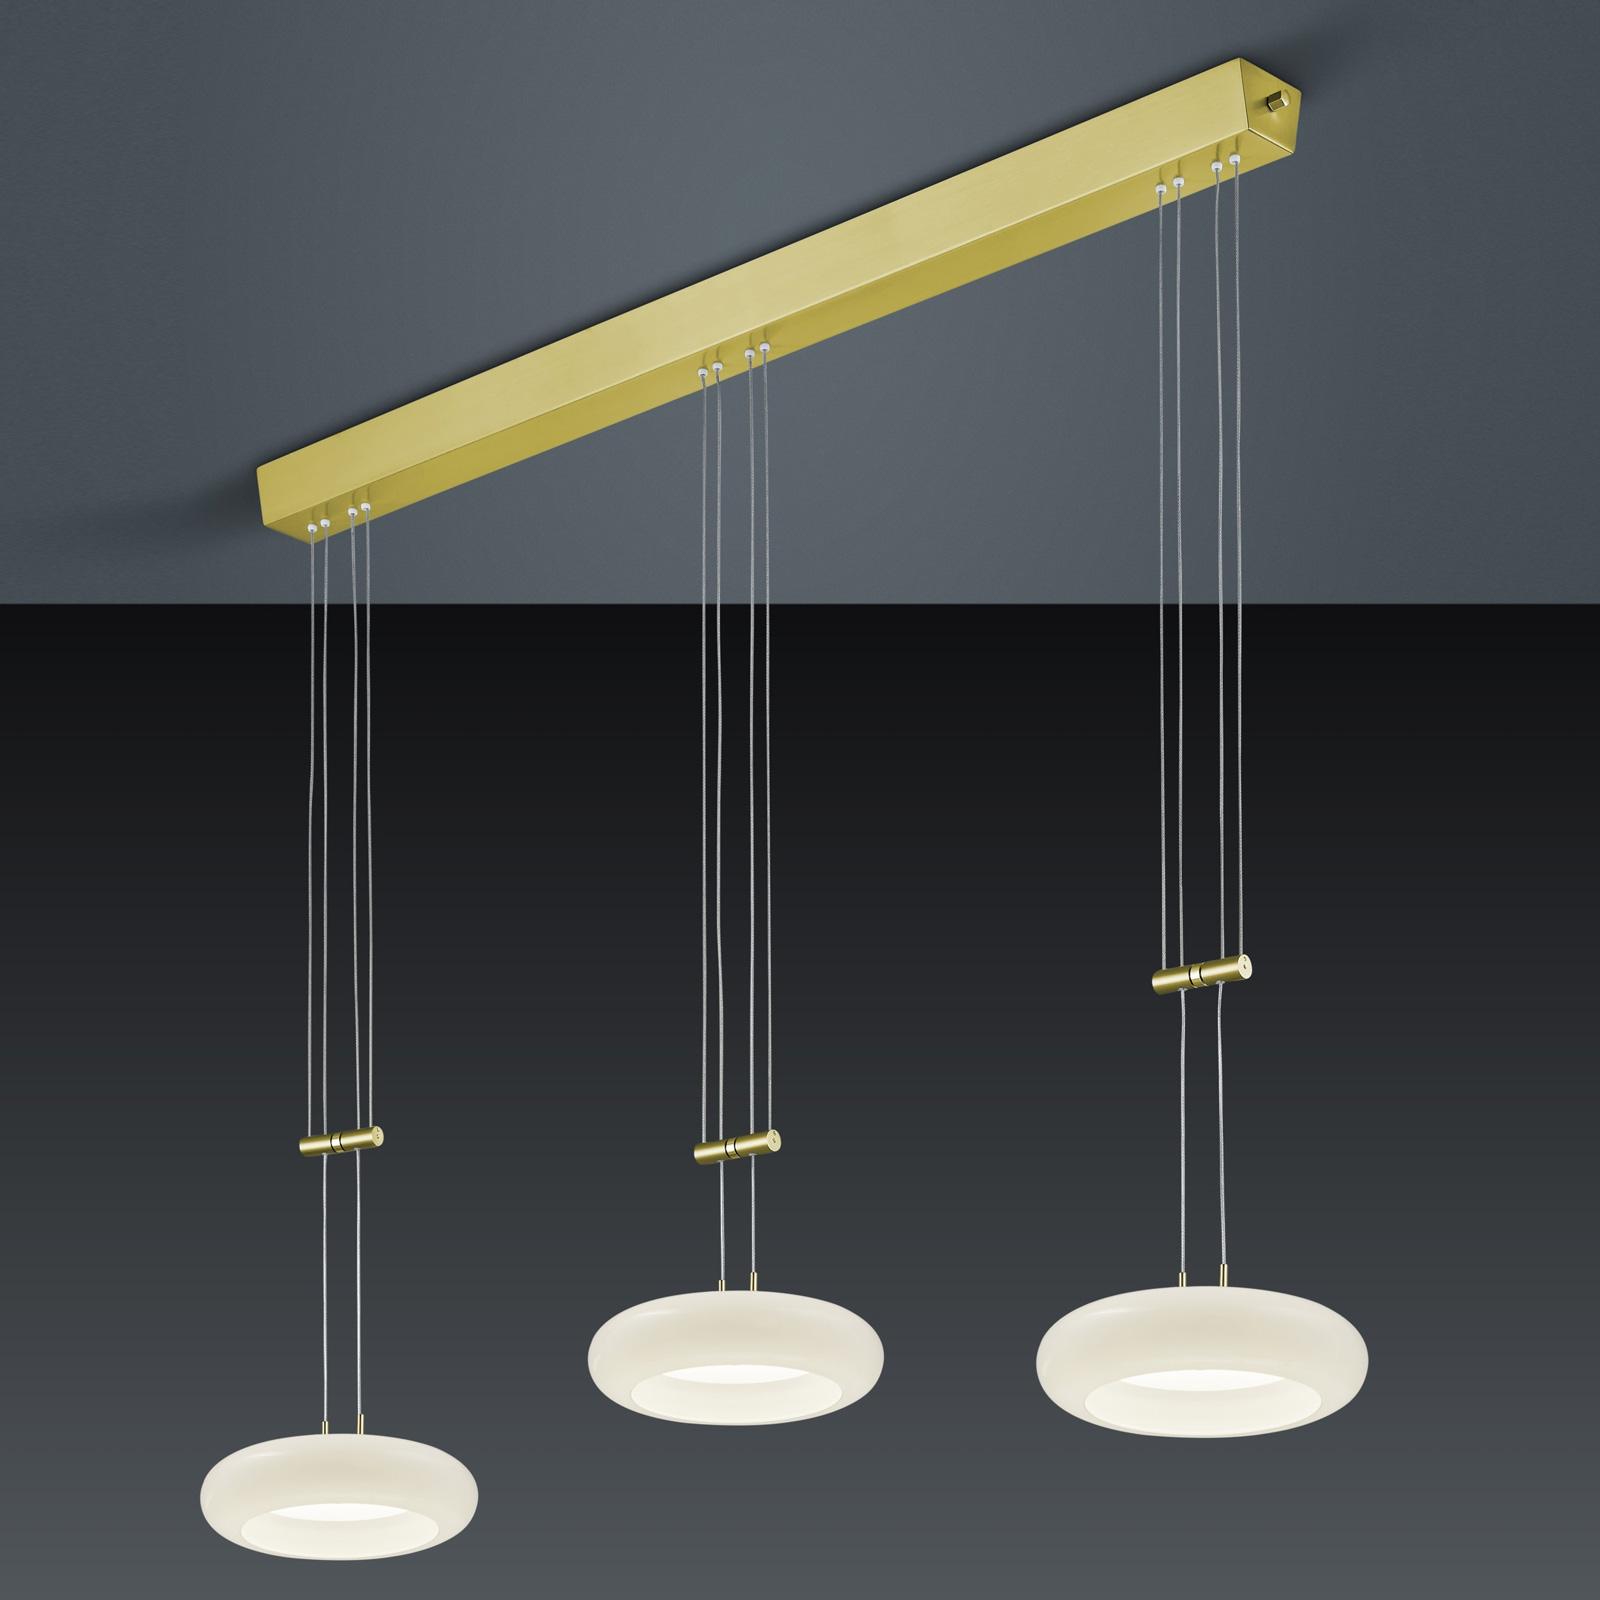 BANKAMP Centa suspension à 3 lampes laiton